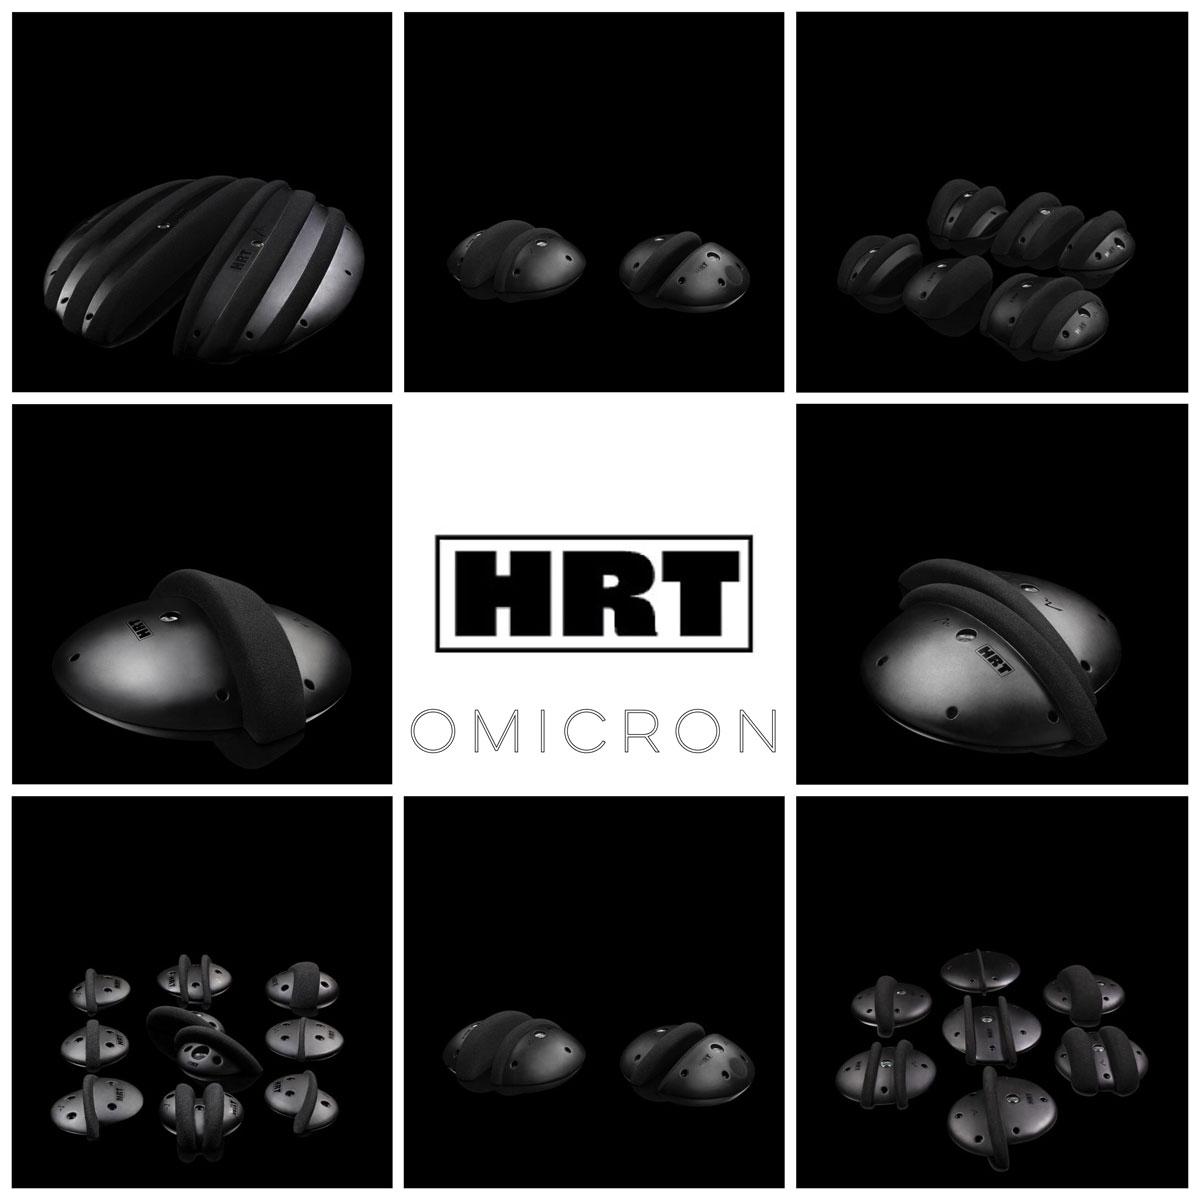 HRT's technical Omicron line by Dario Stefanou